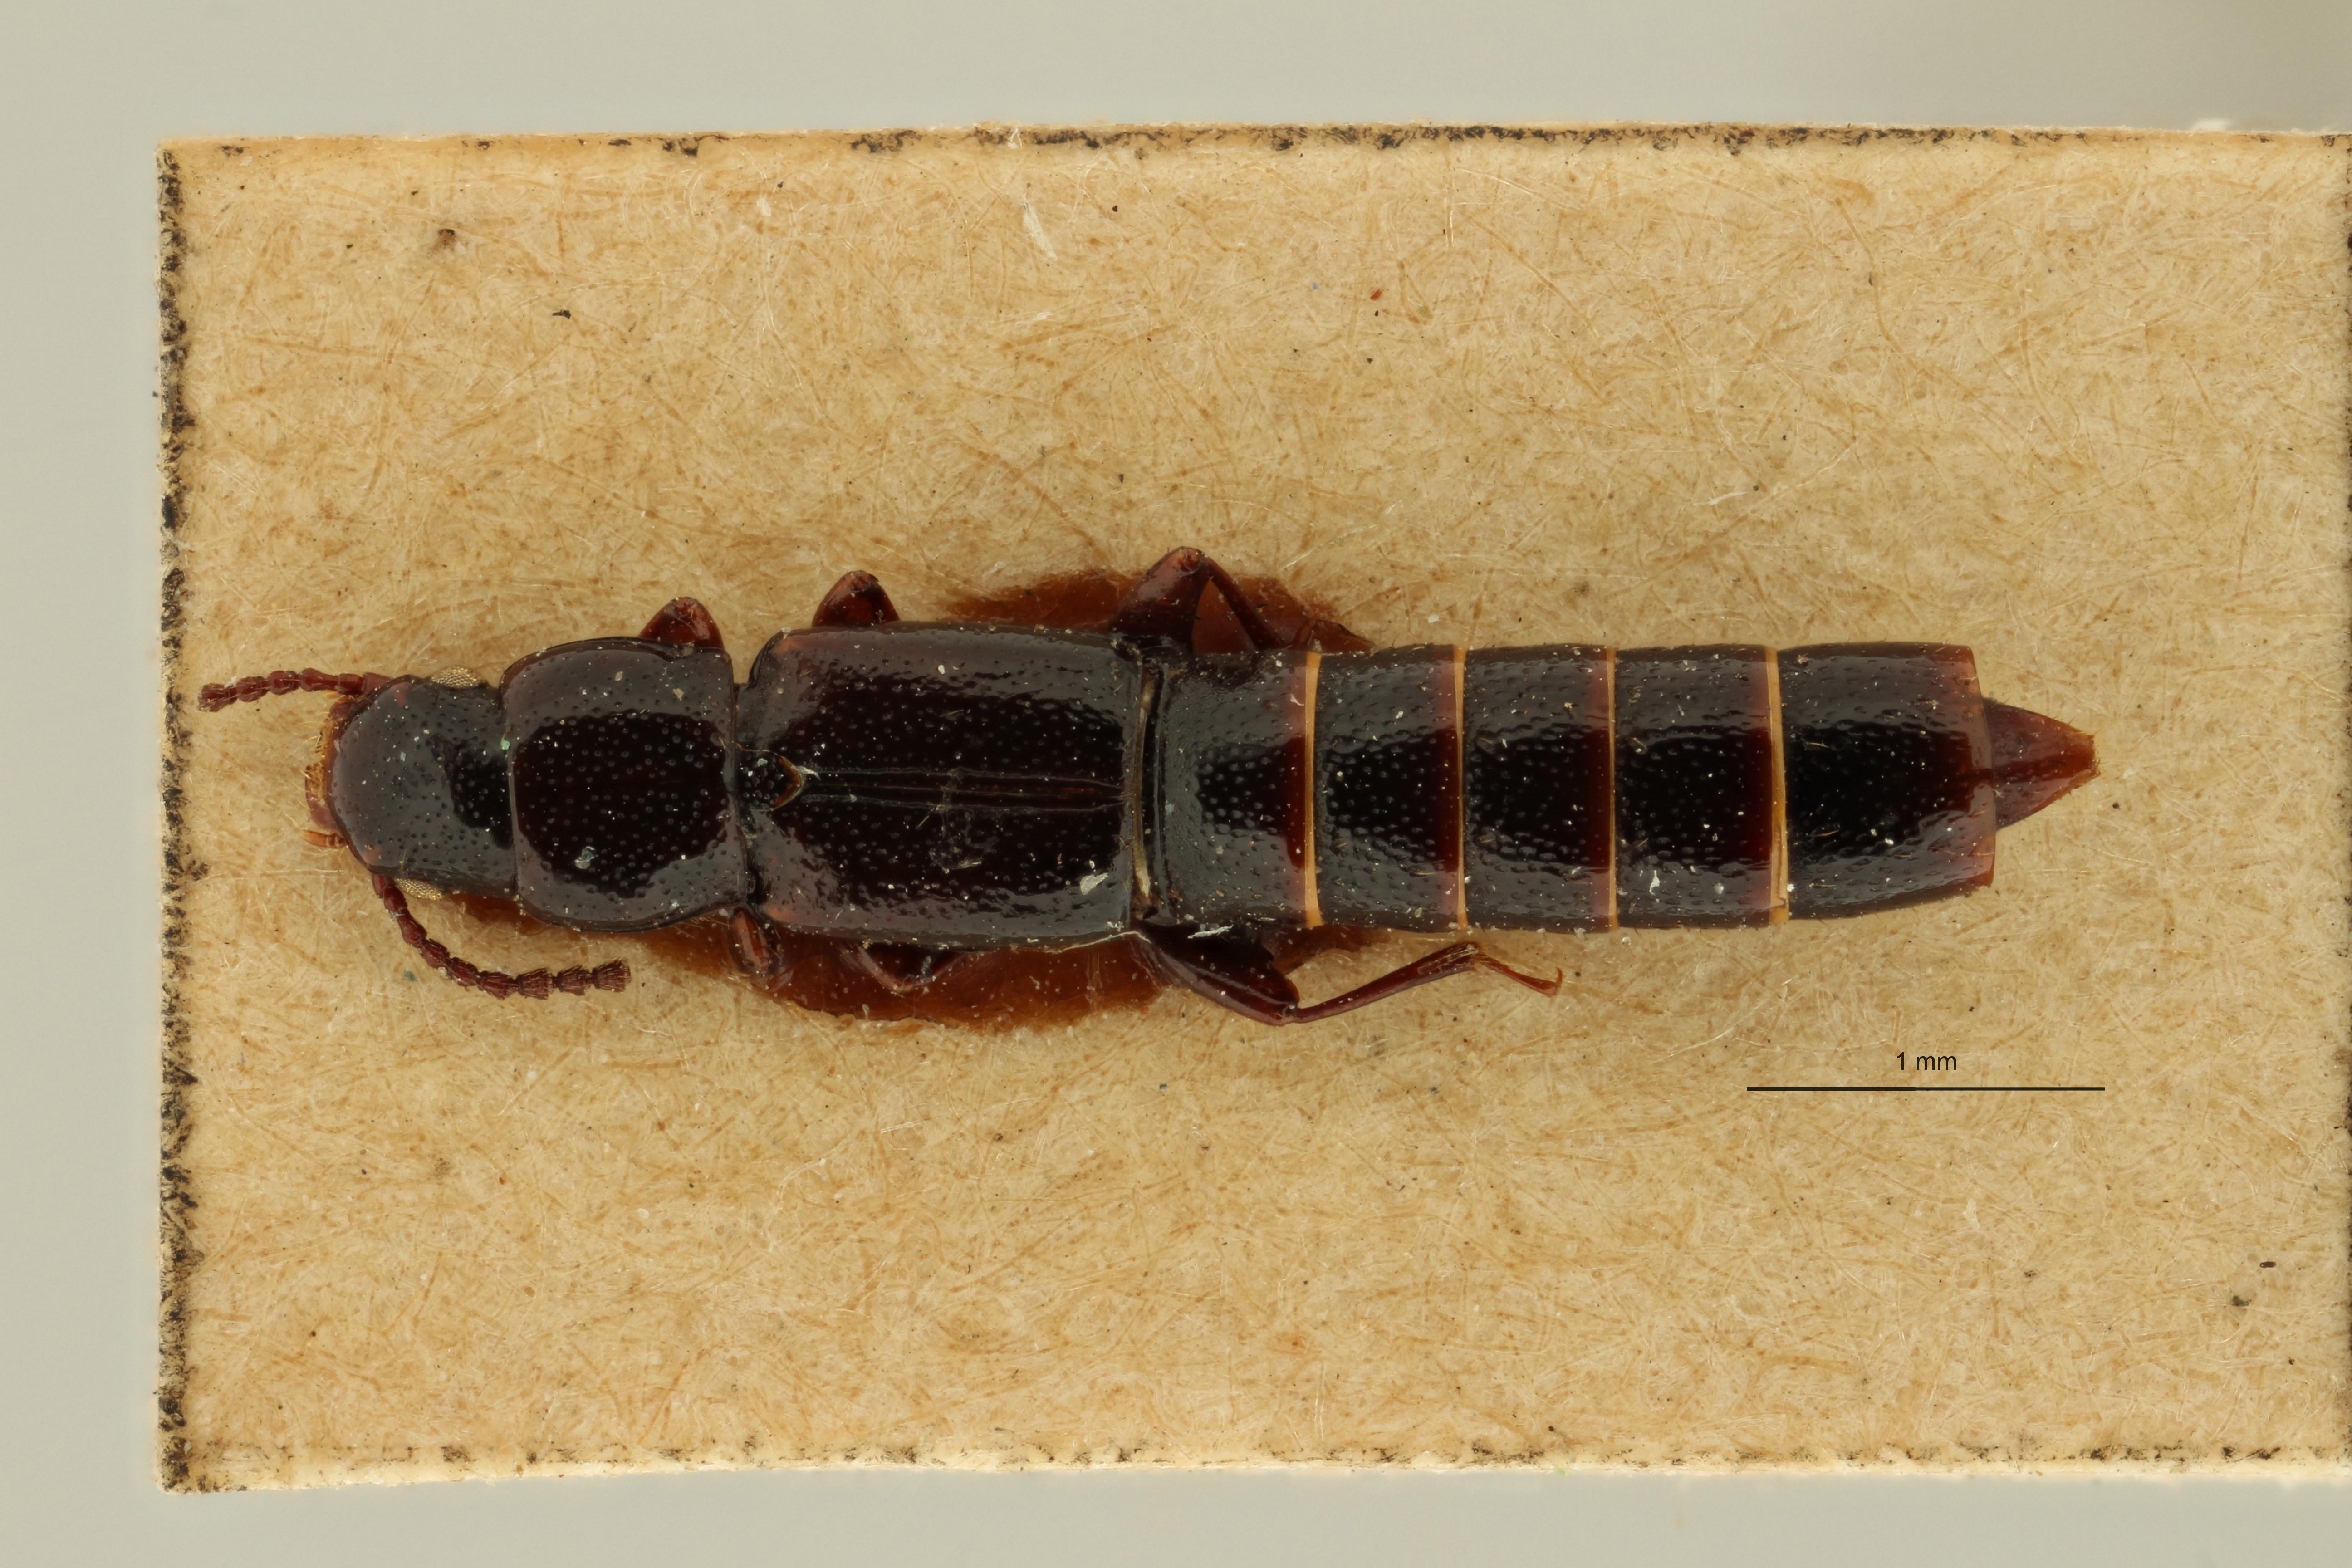 Lispinus acicularis t D ZS PMax Scaled.jpeg